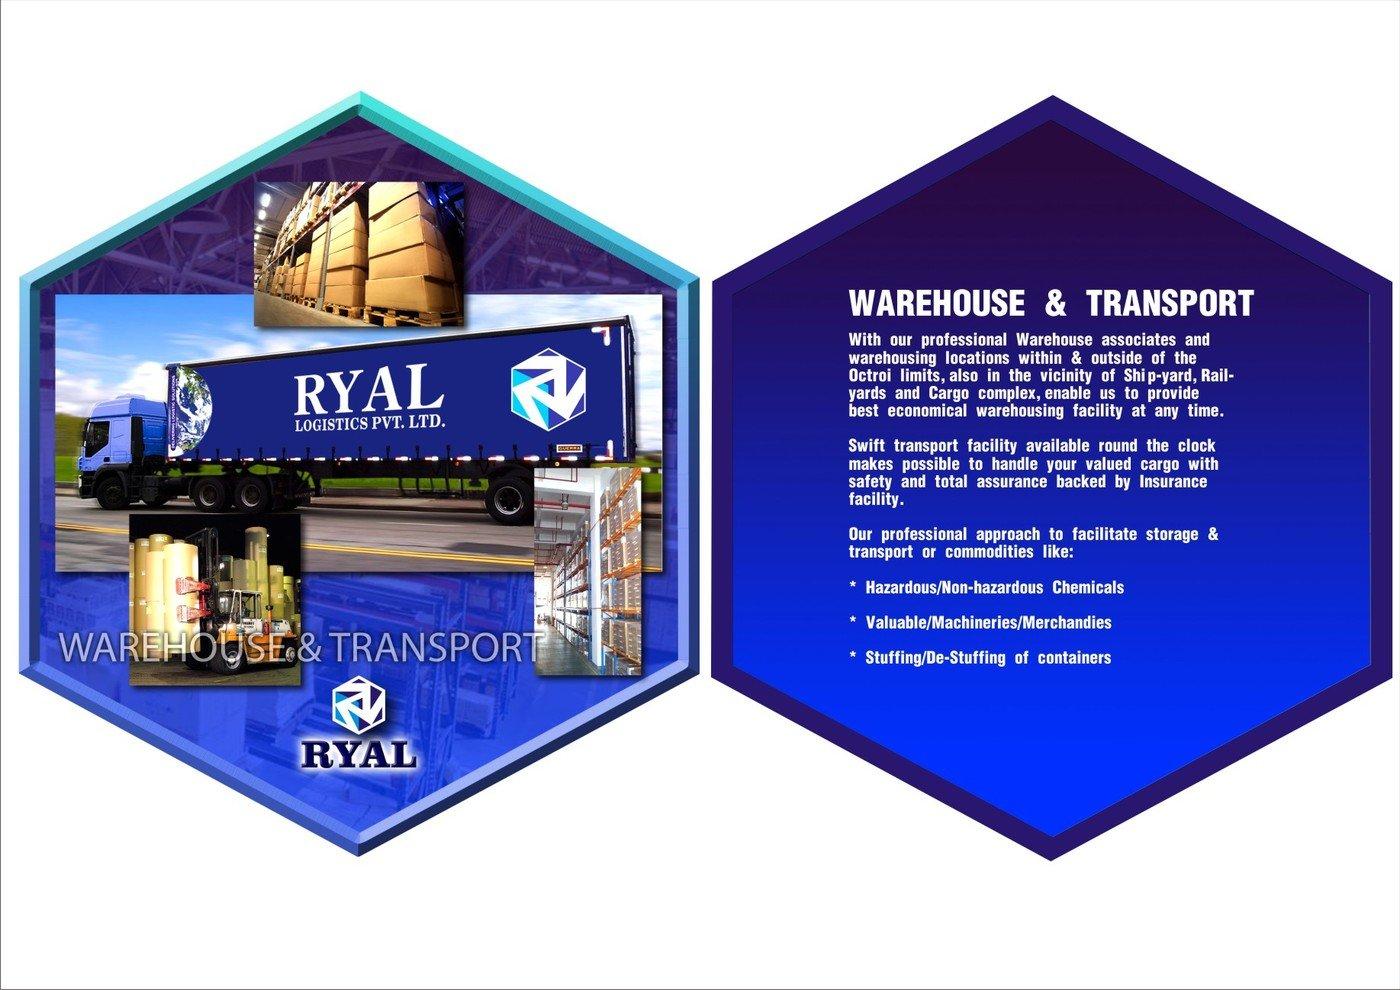 starbucks warehousing and transportation